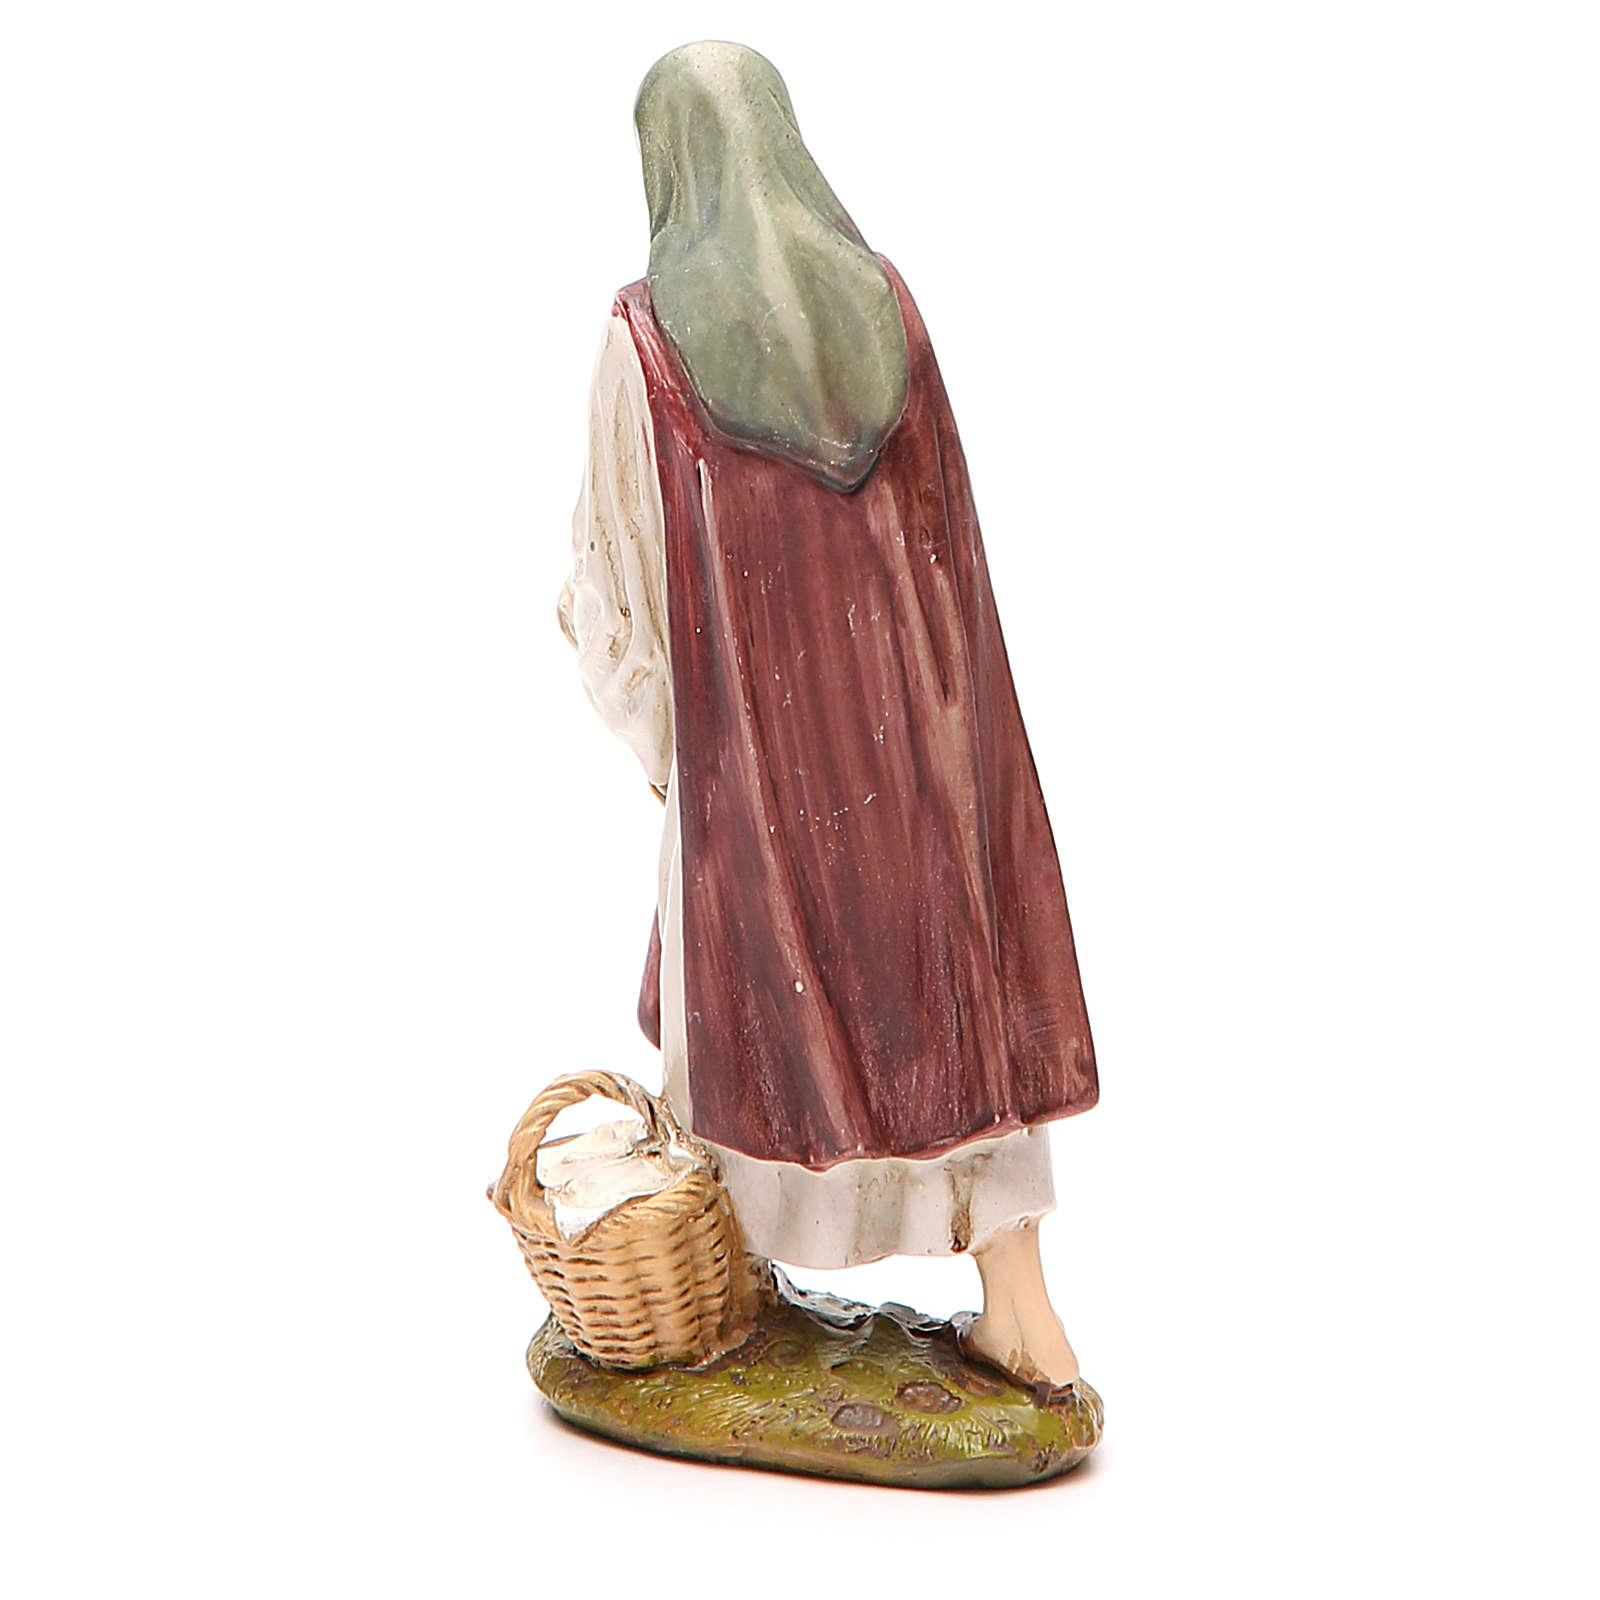 Pastora con gallina resina pintada 12 cm Linea economica Landi 3